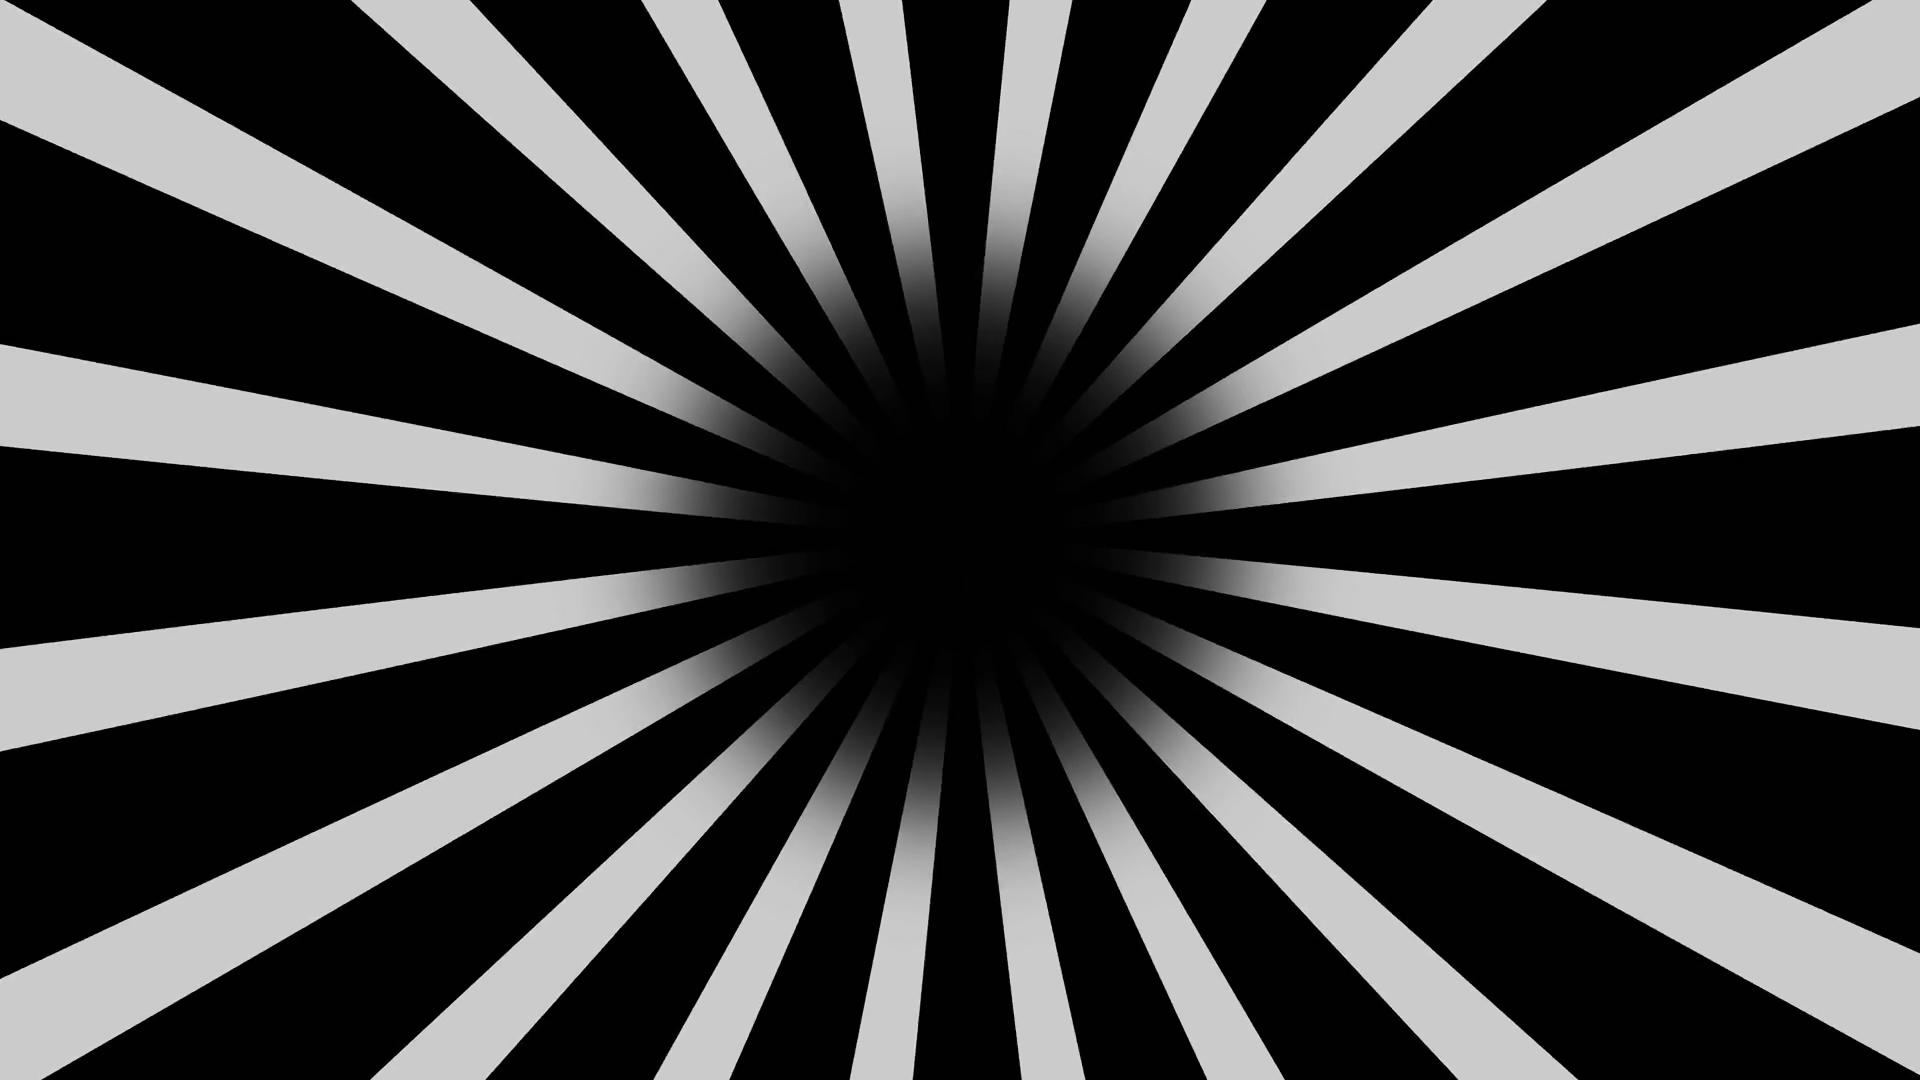 1920x1080 Black And White Burst Vector Background. Cartoon Comic Background